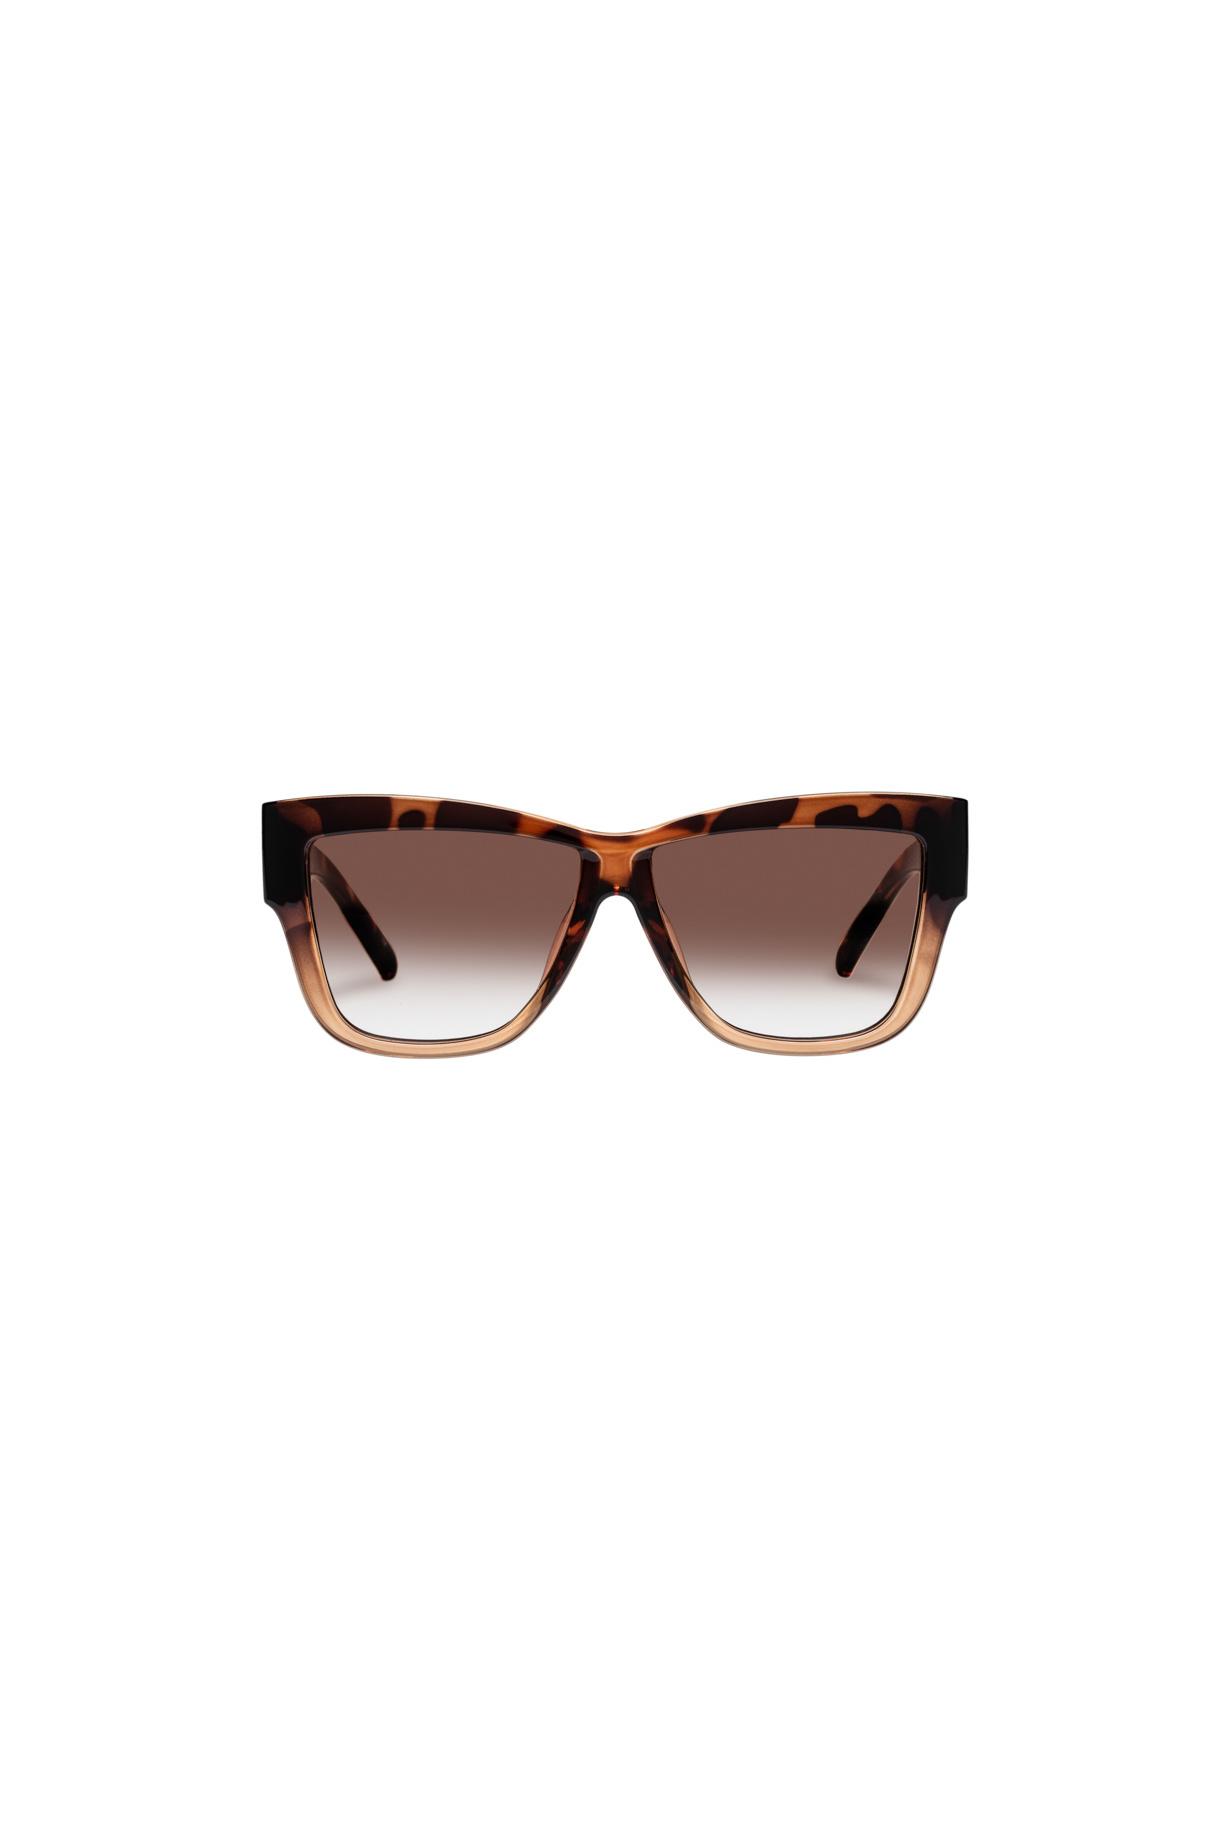 Total Eclipse Sunglasses - Tortoise Tan-1